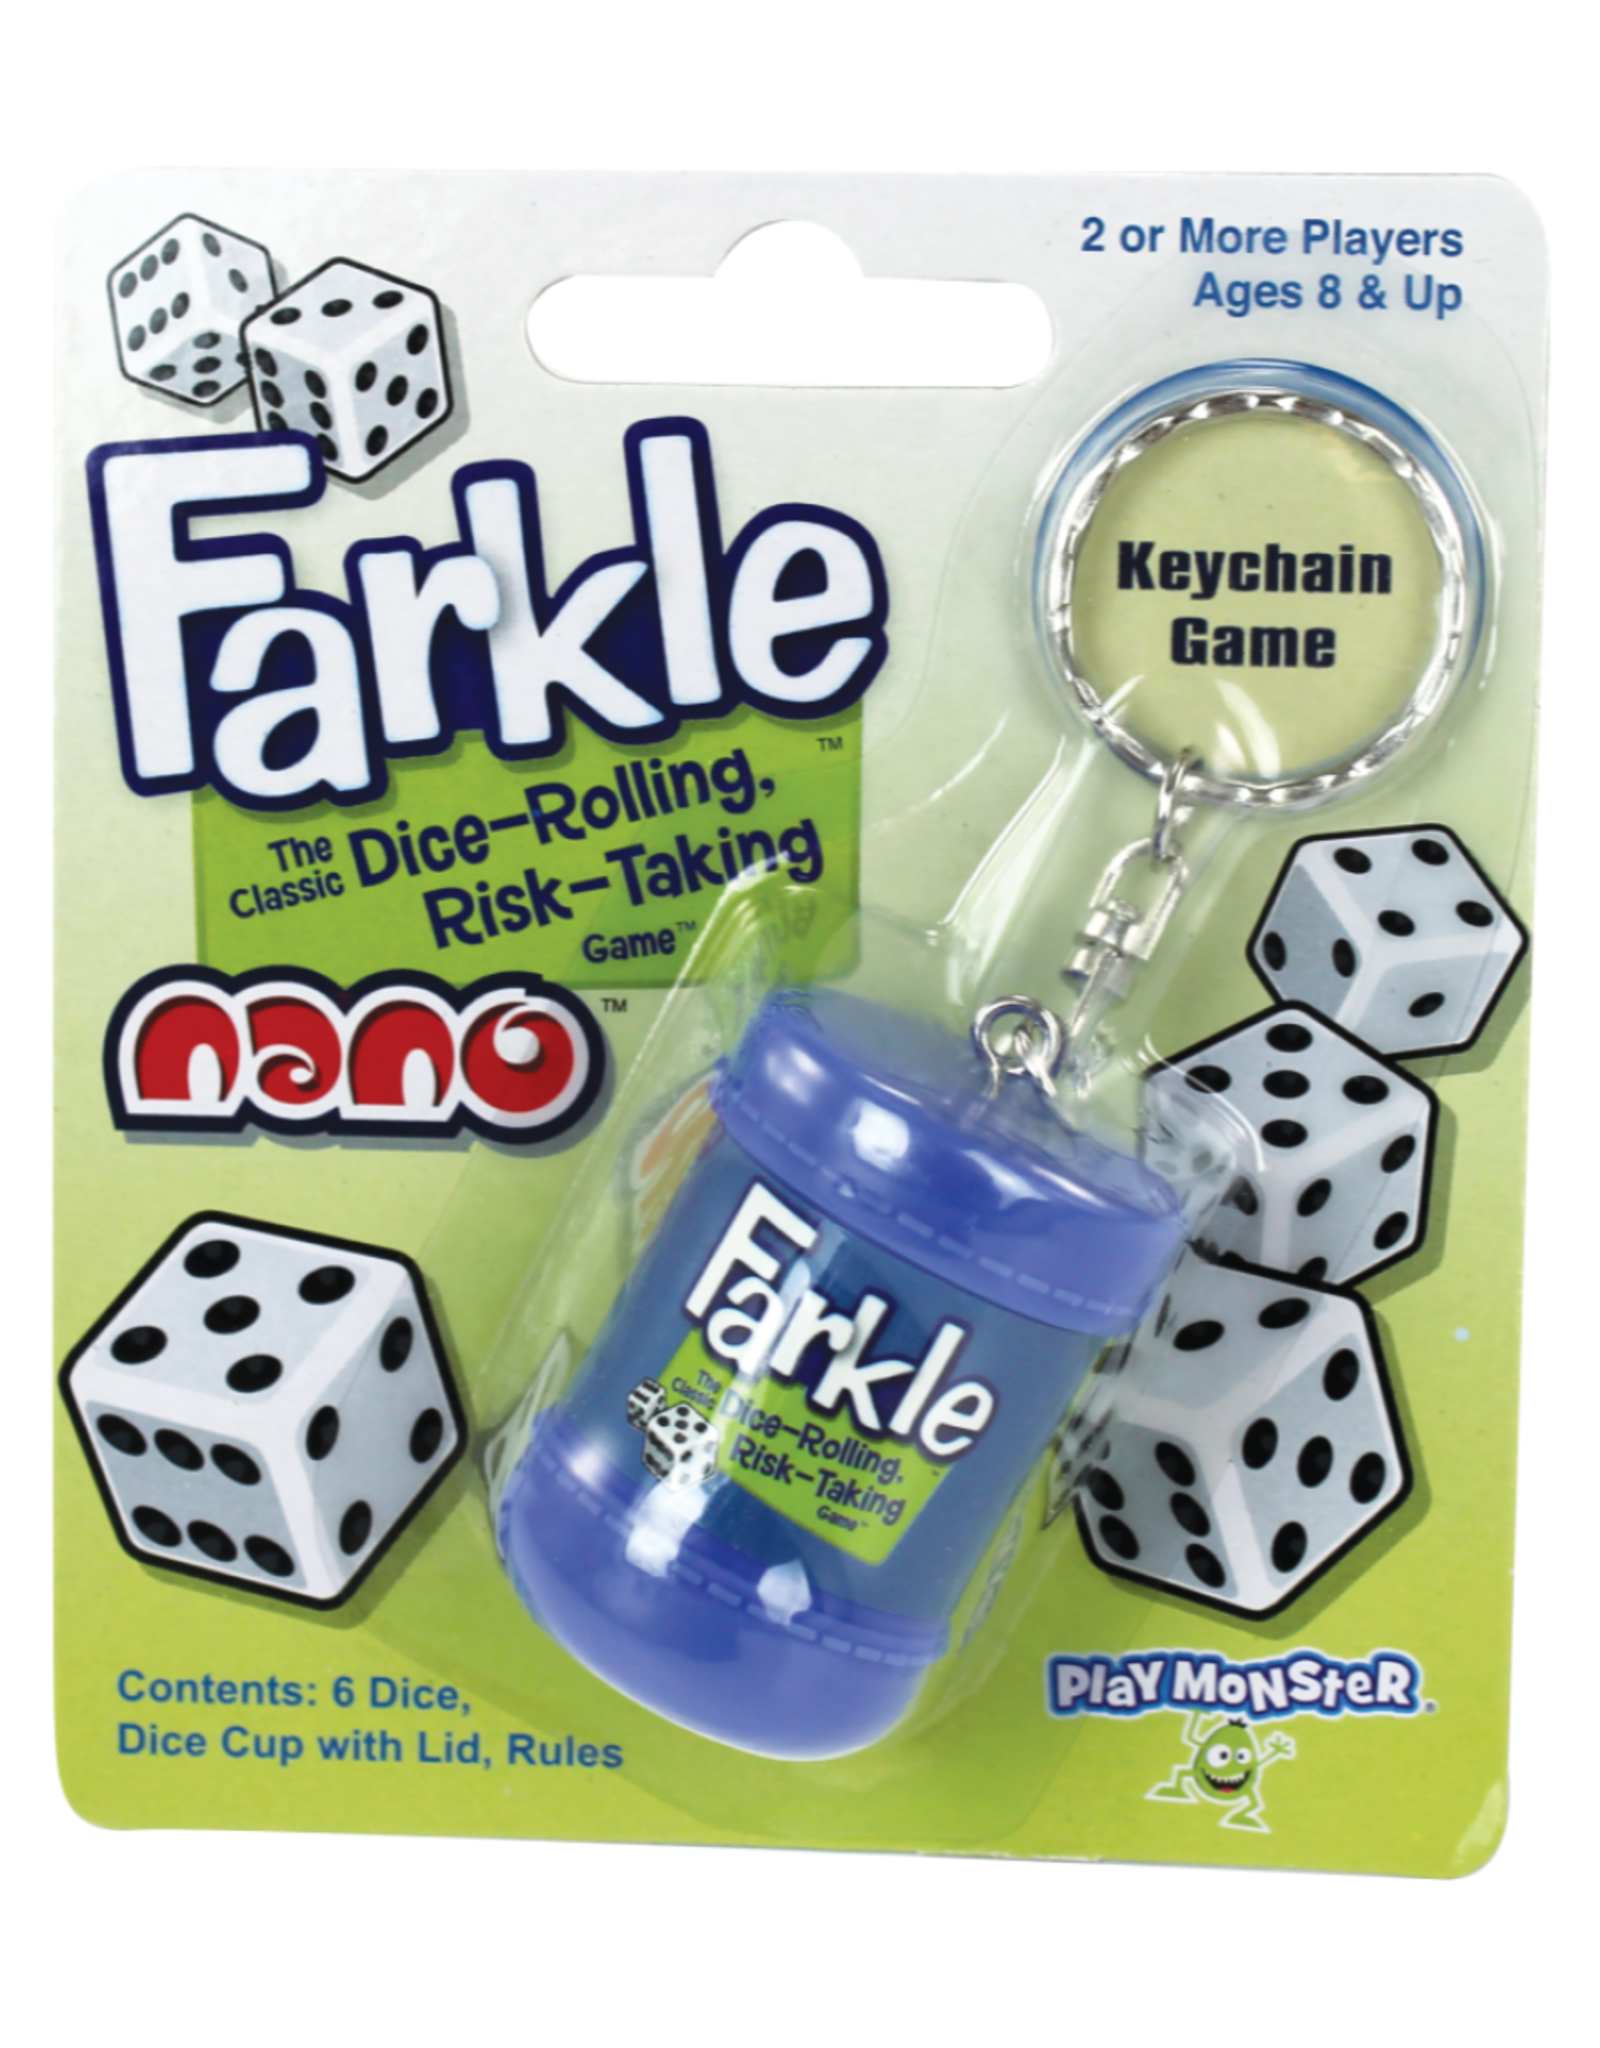 FARKLE Farkle Nano Keychain